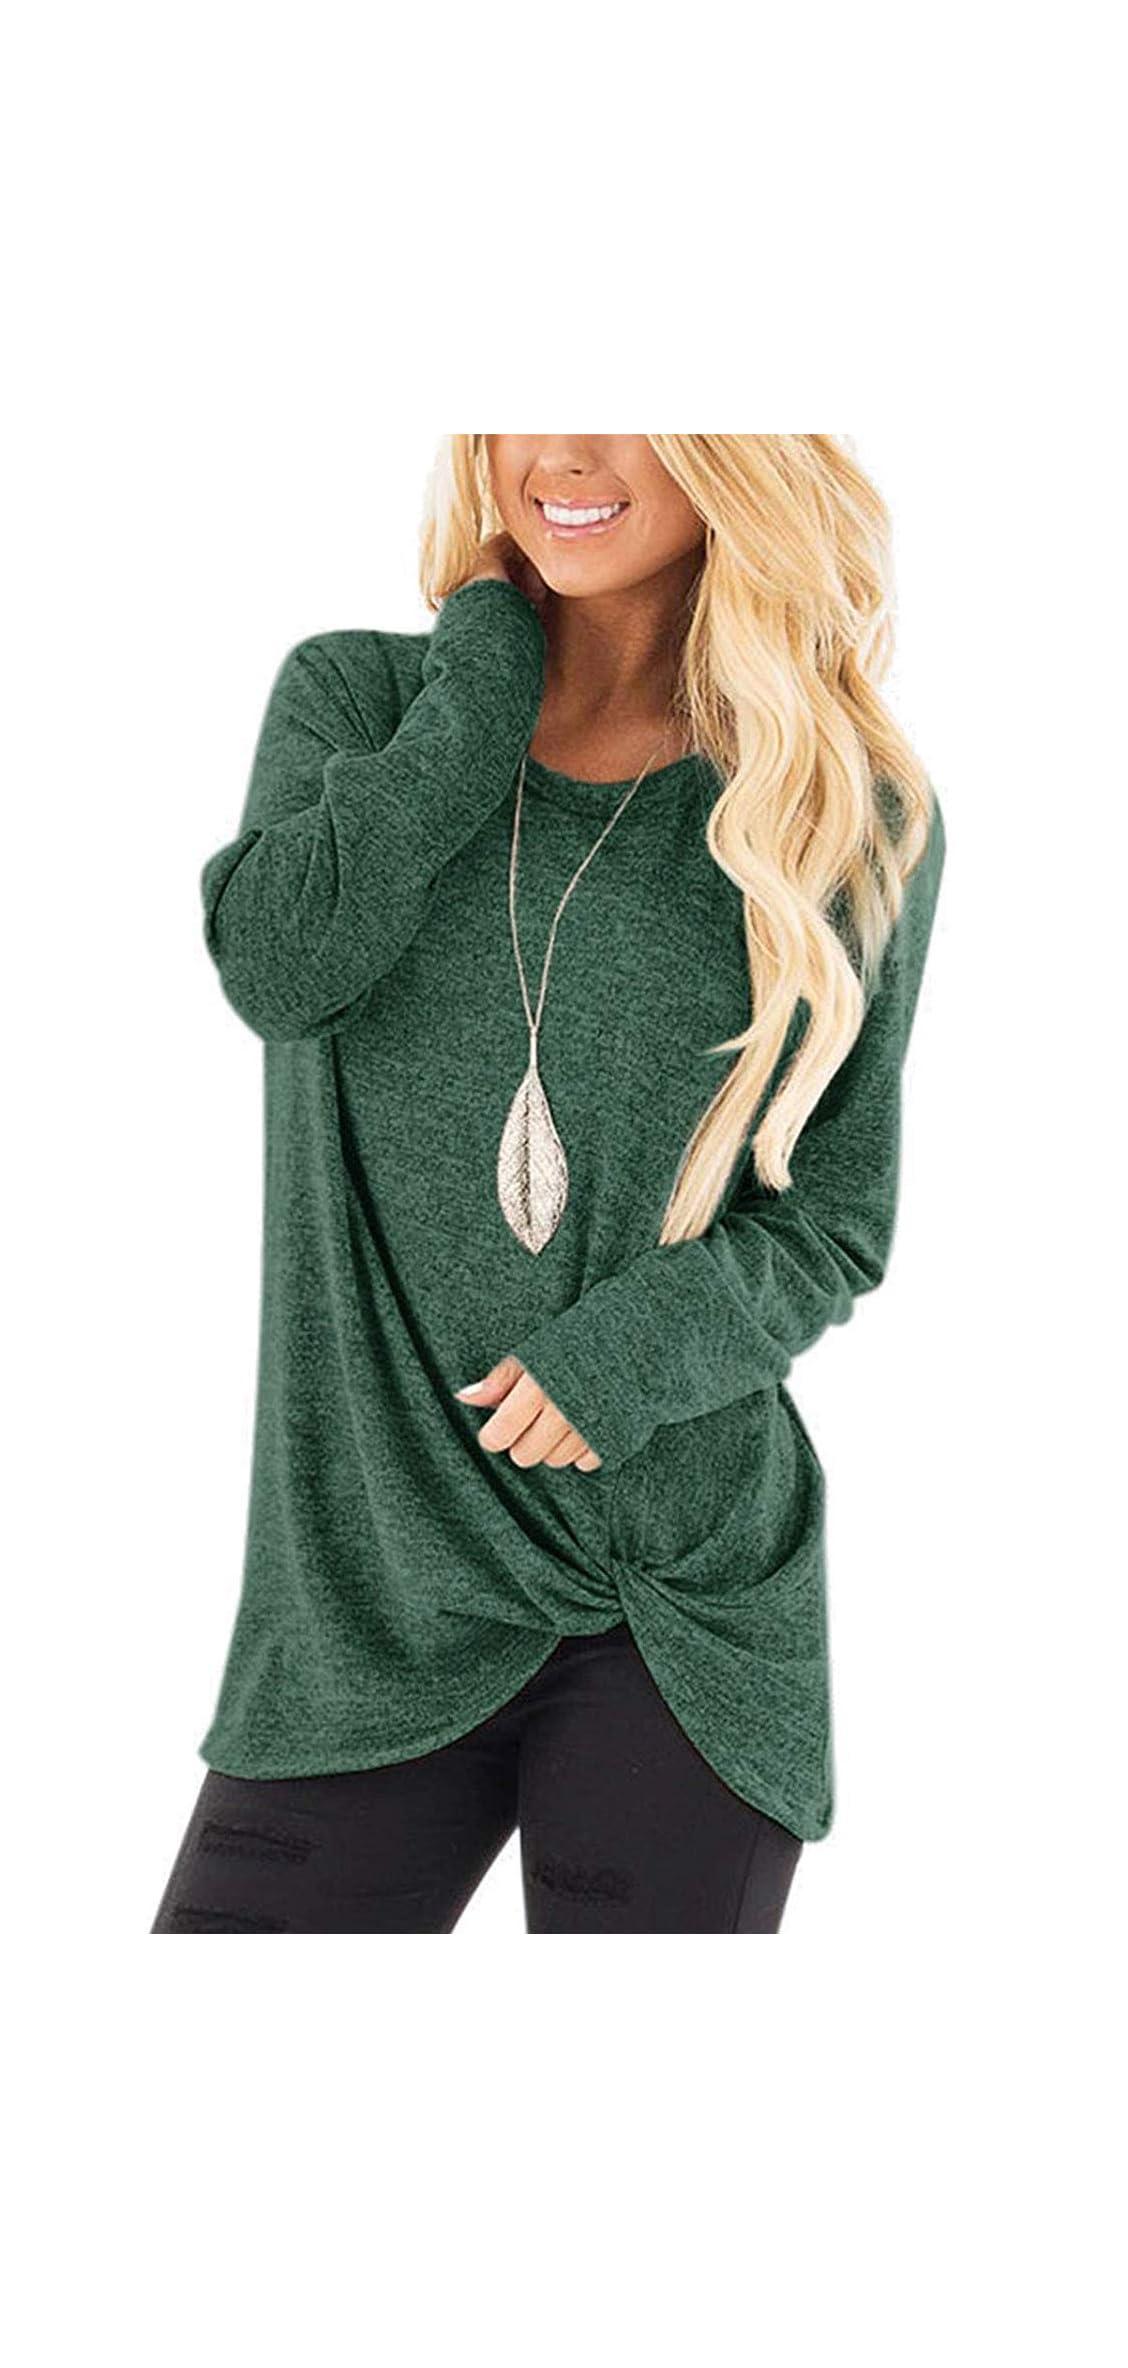 Women's Casual Solid T Shirts Twist Knot Tunics Tops